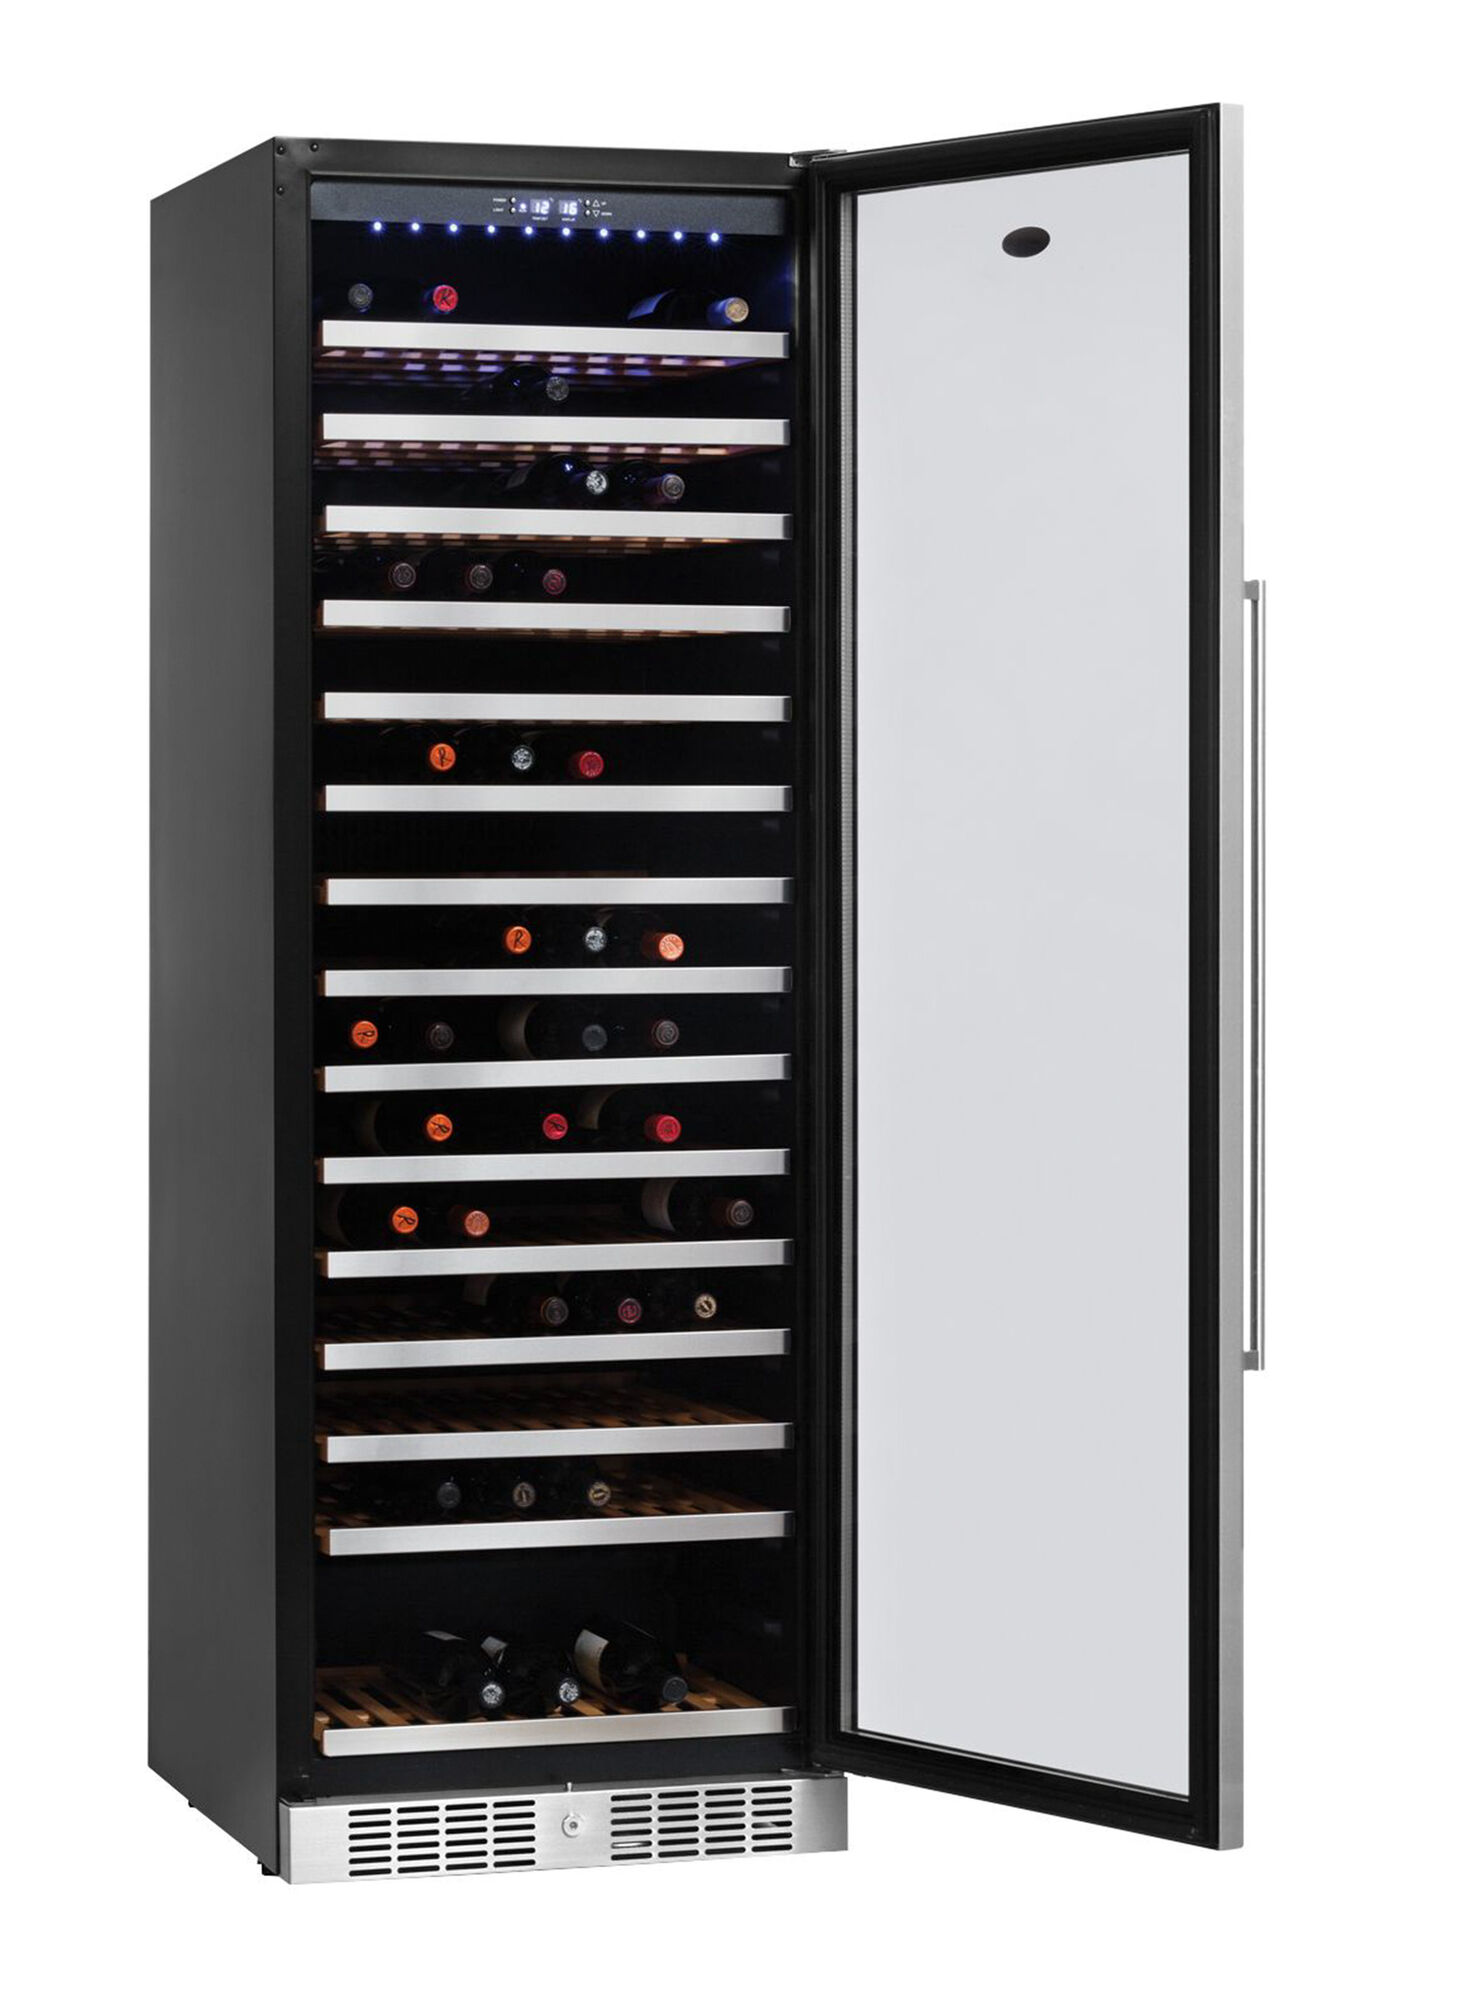 ... Vinos Premium Winefroz MN168S 165 Botellas. Cava%20de%20Vinos%20Premium%20Winefroz%20MN168S%20165%20Botellas%  ... 2da82ffb9847